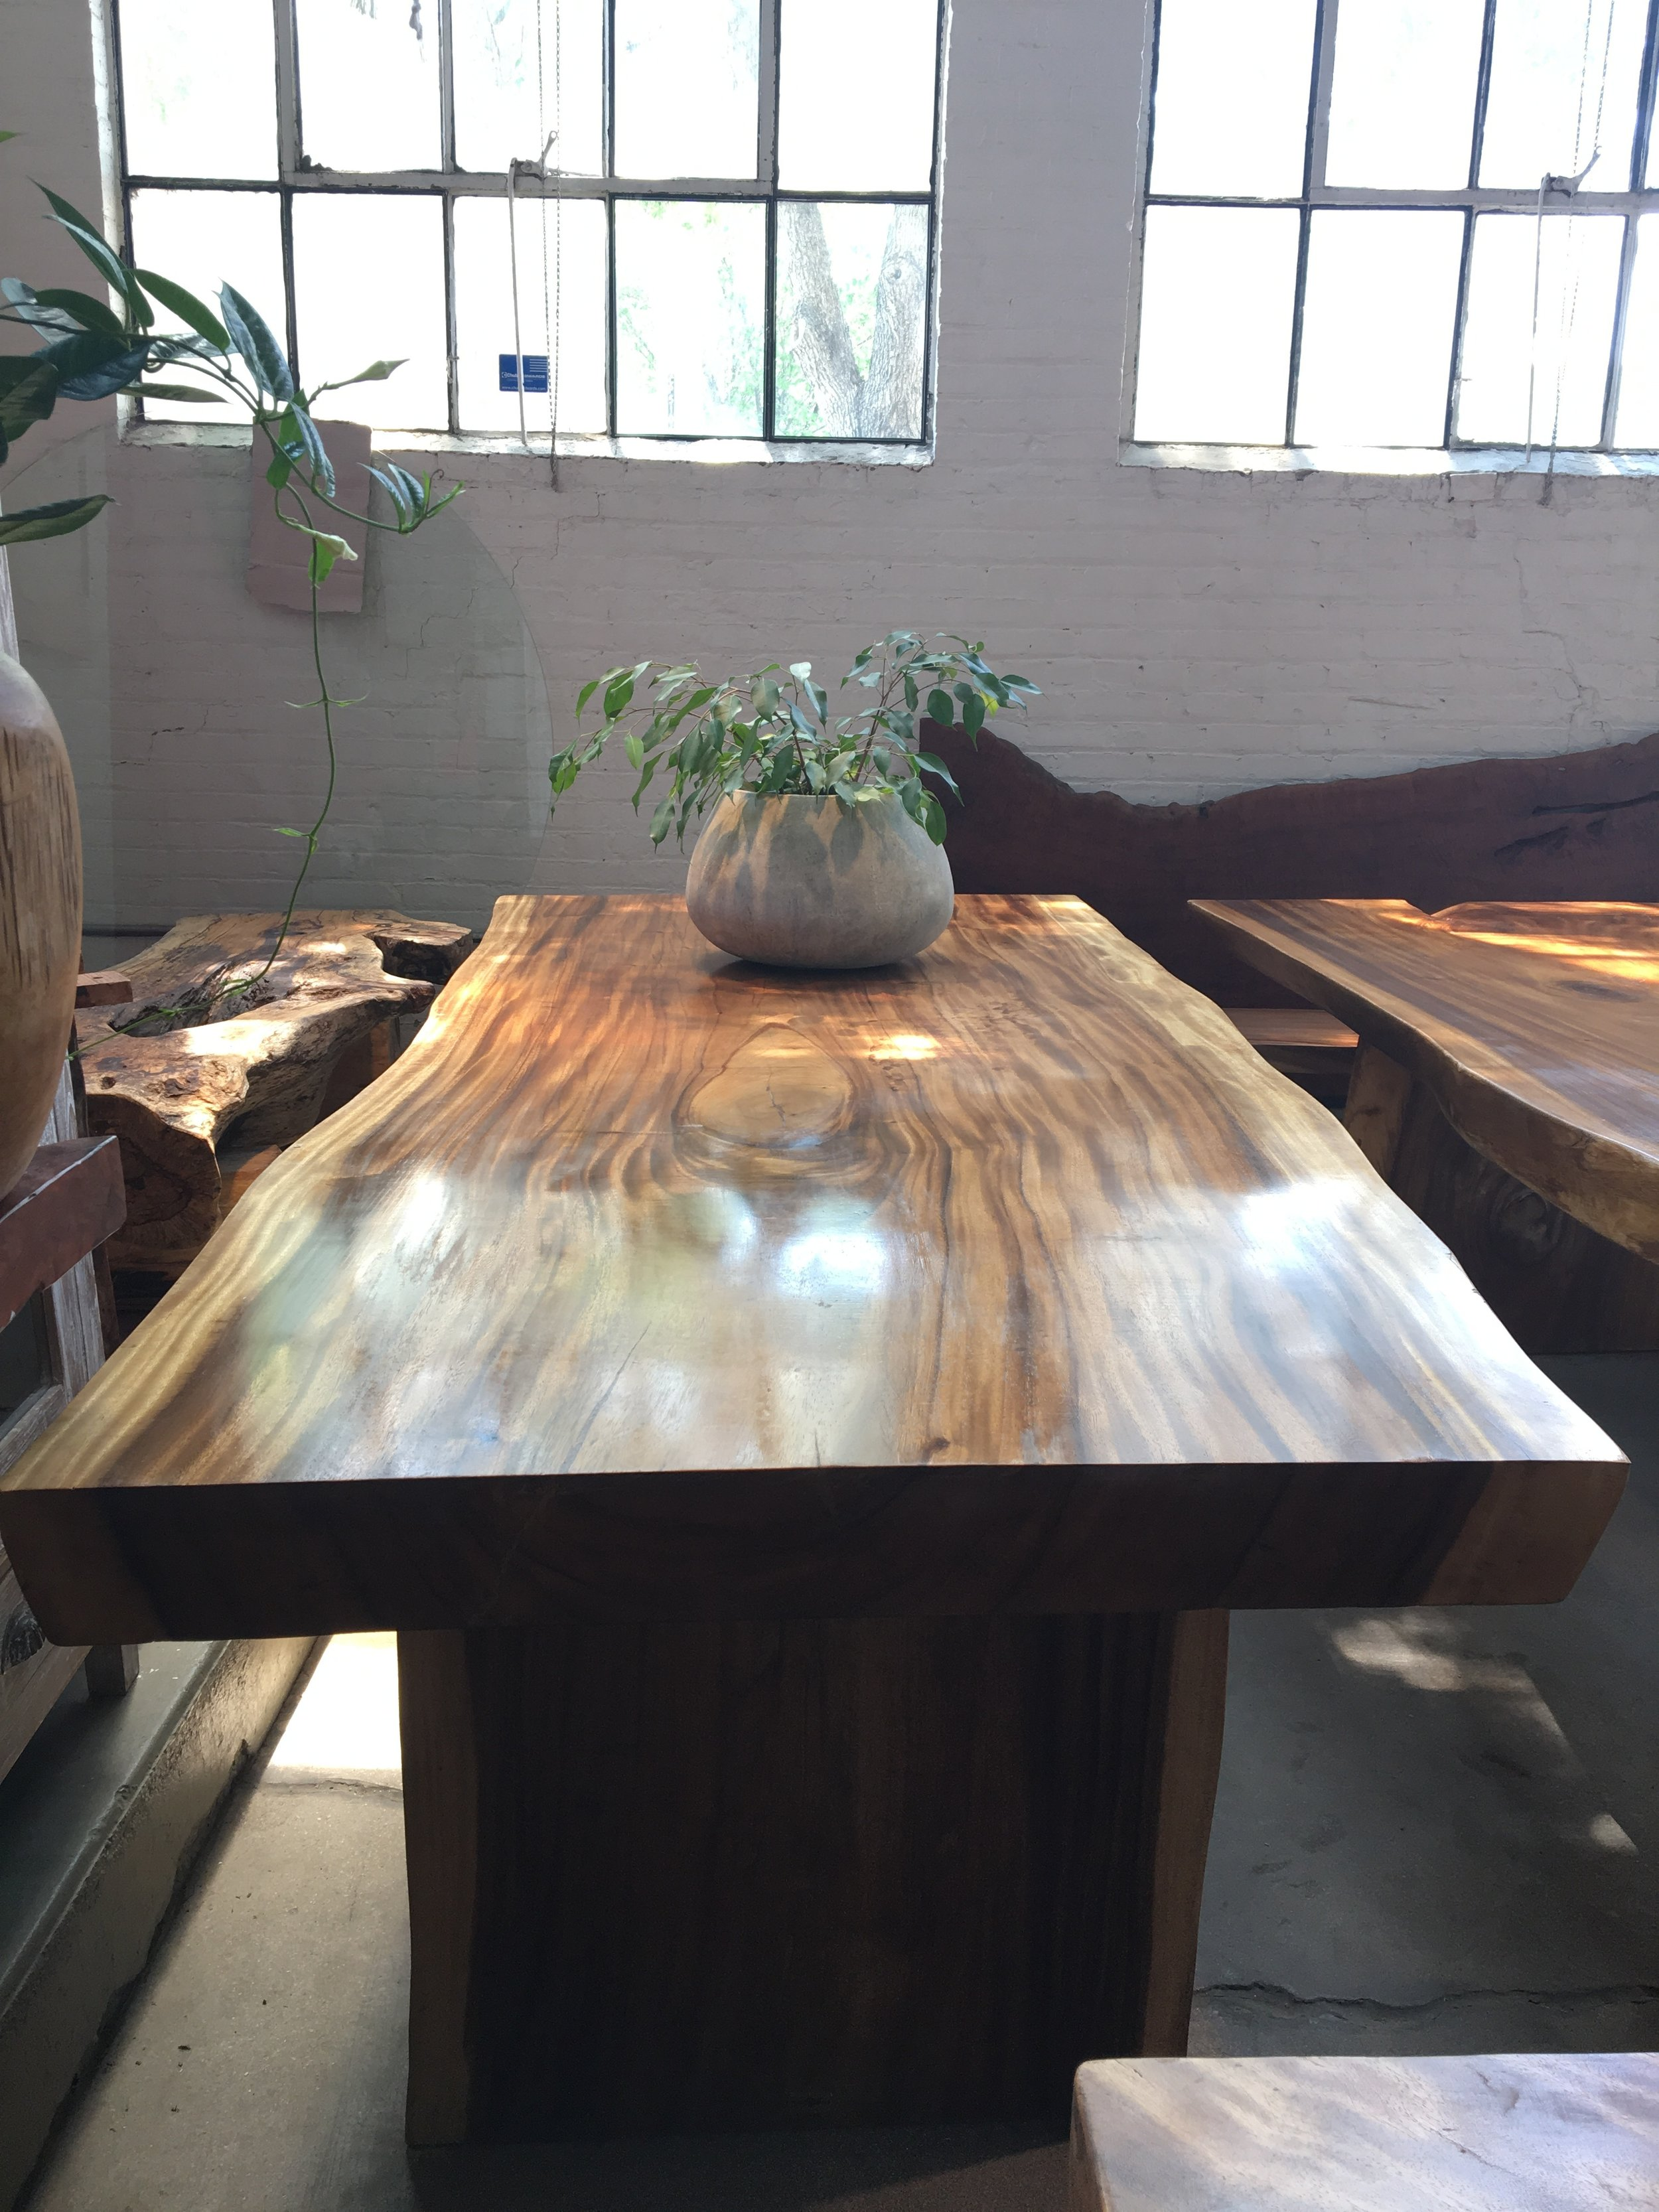 extra wide live edge dining table. luxury, modern furniture in winnipeg, canada.JPG